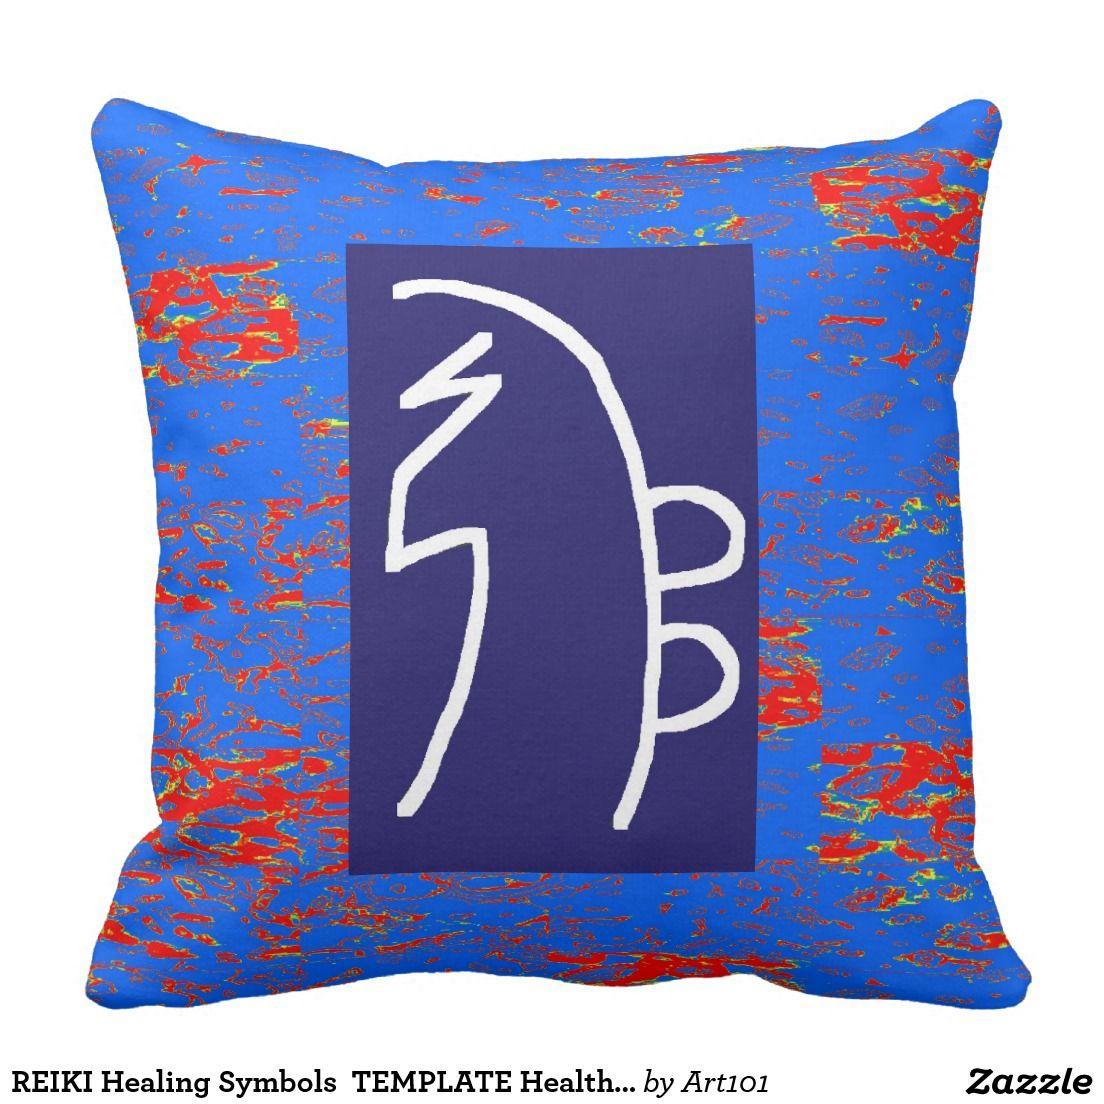 REIKI Healing Symbols TEMPLATE Health Wellbeing Throw Pillow | 101 ...